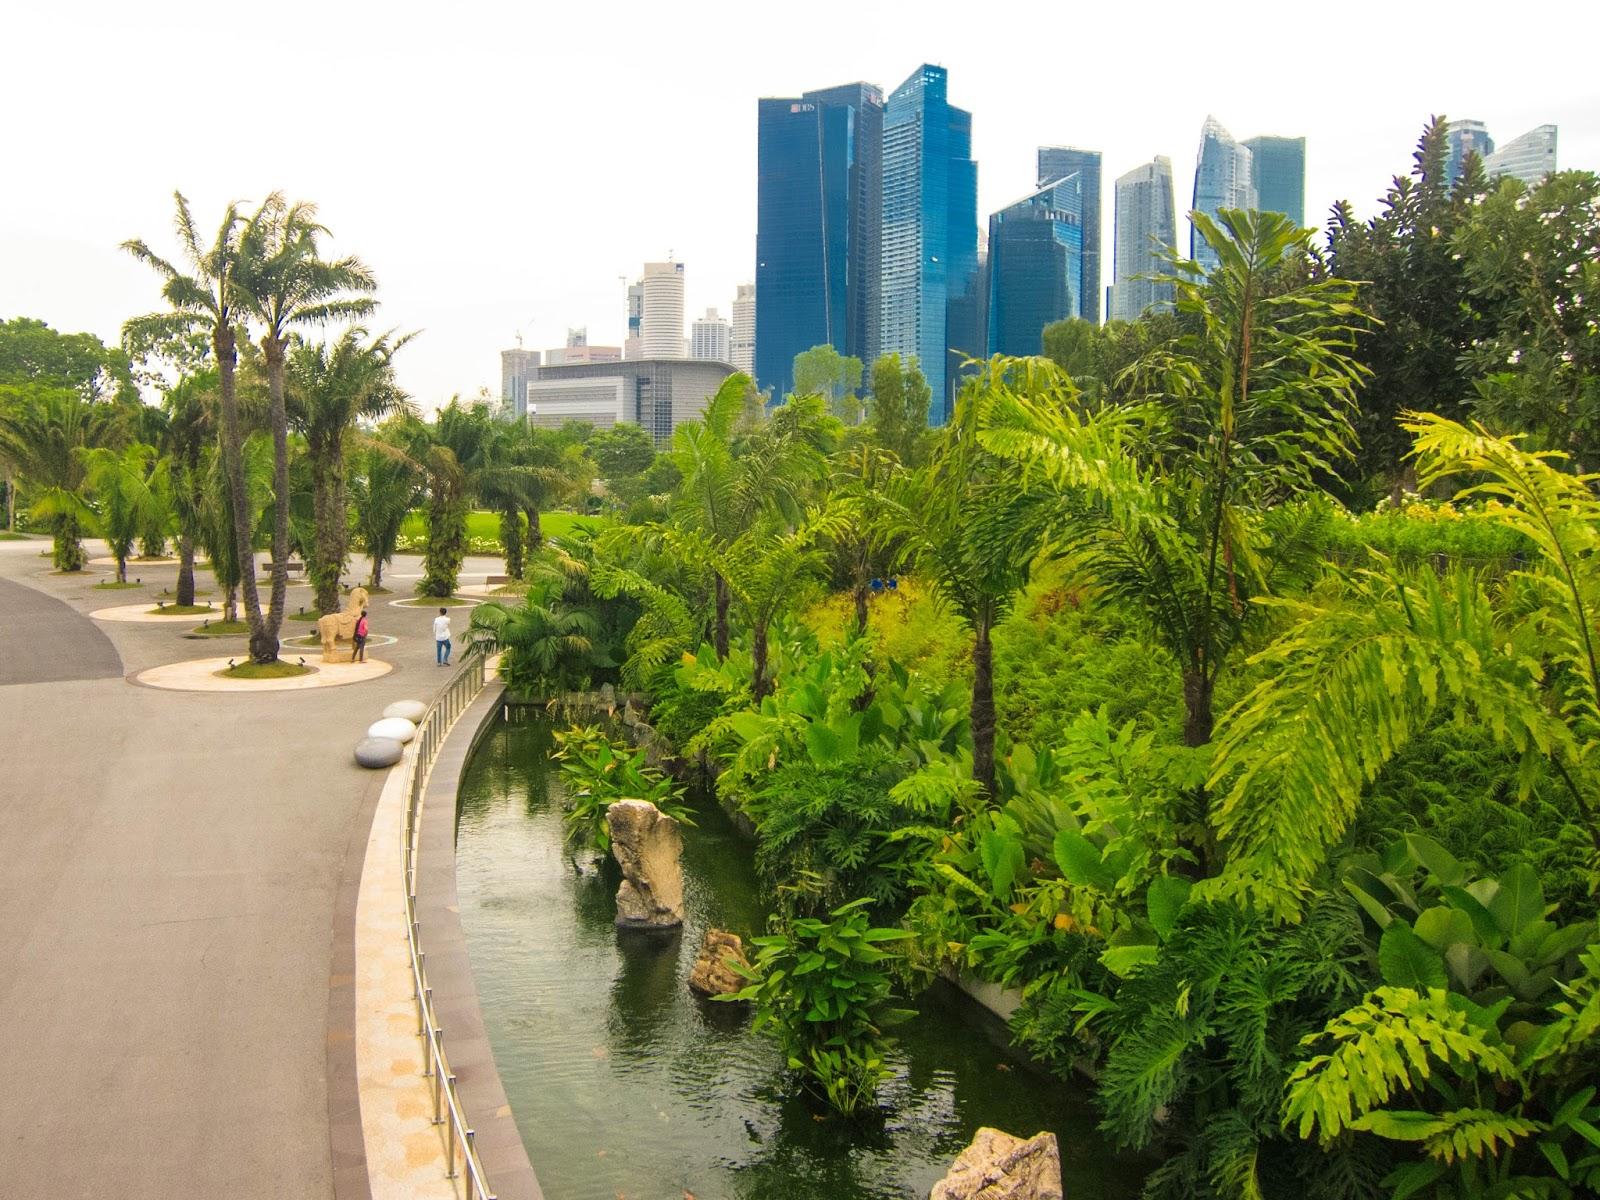 Singapore: A city in a garden | Svelte Salivations - Travel